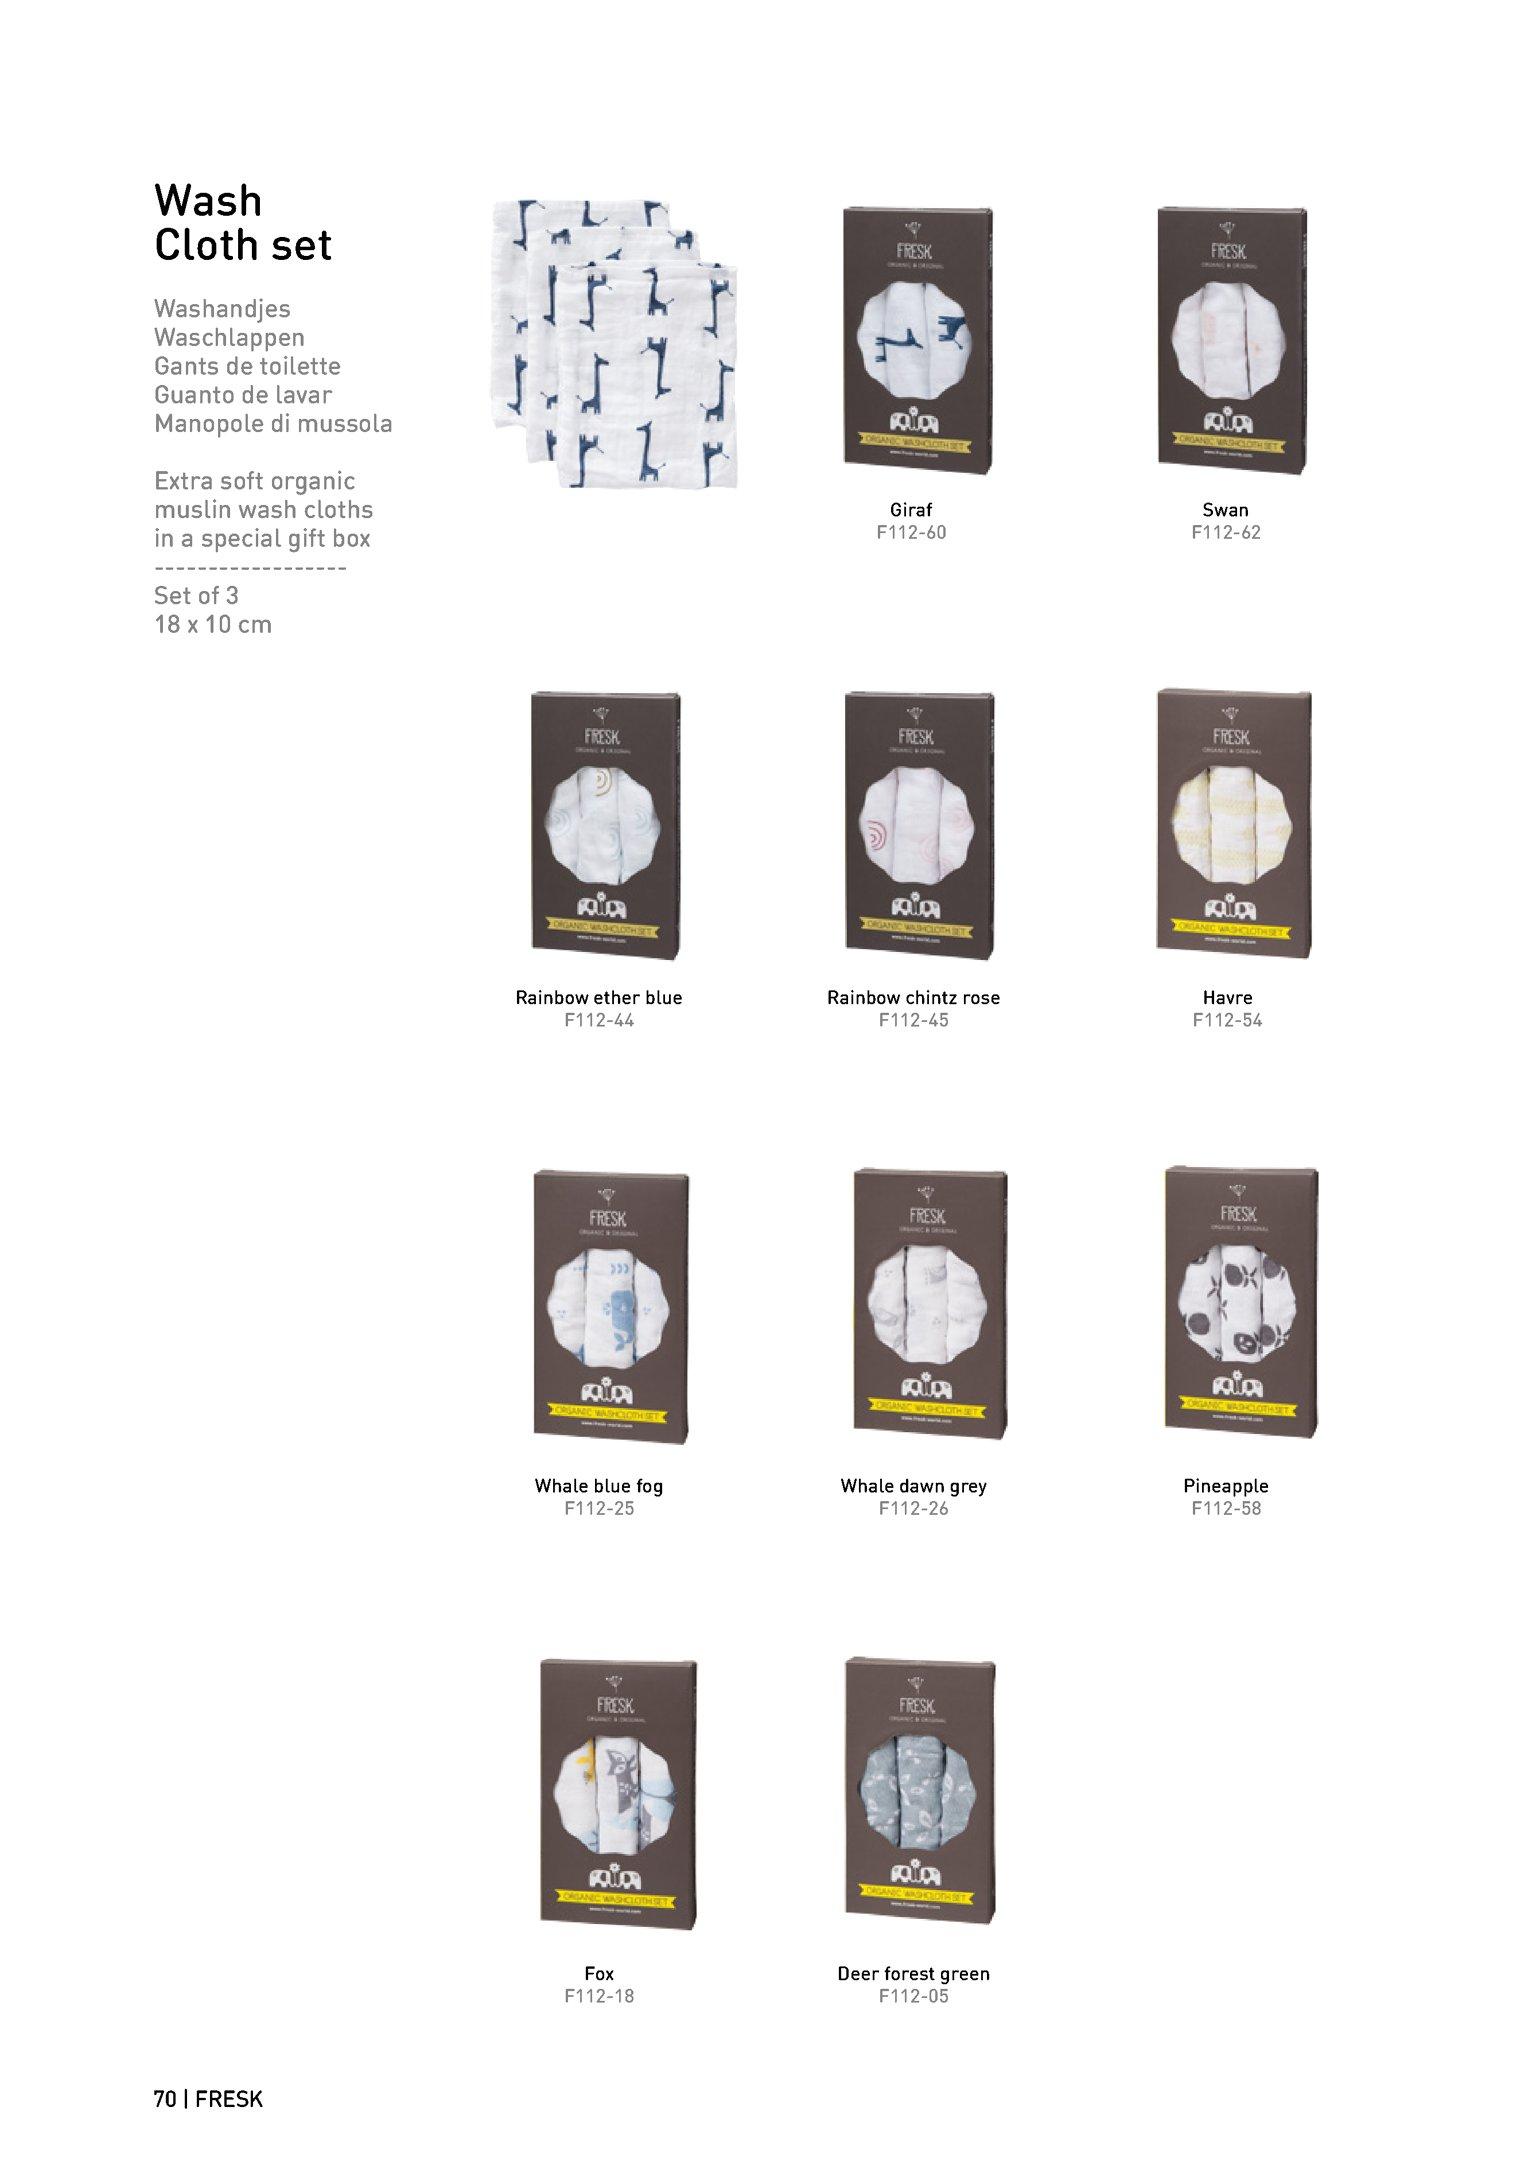 Le Vie Del Cotone Copripiumino.Fresk Catalogue 2018 By 3d Flipbook Com